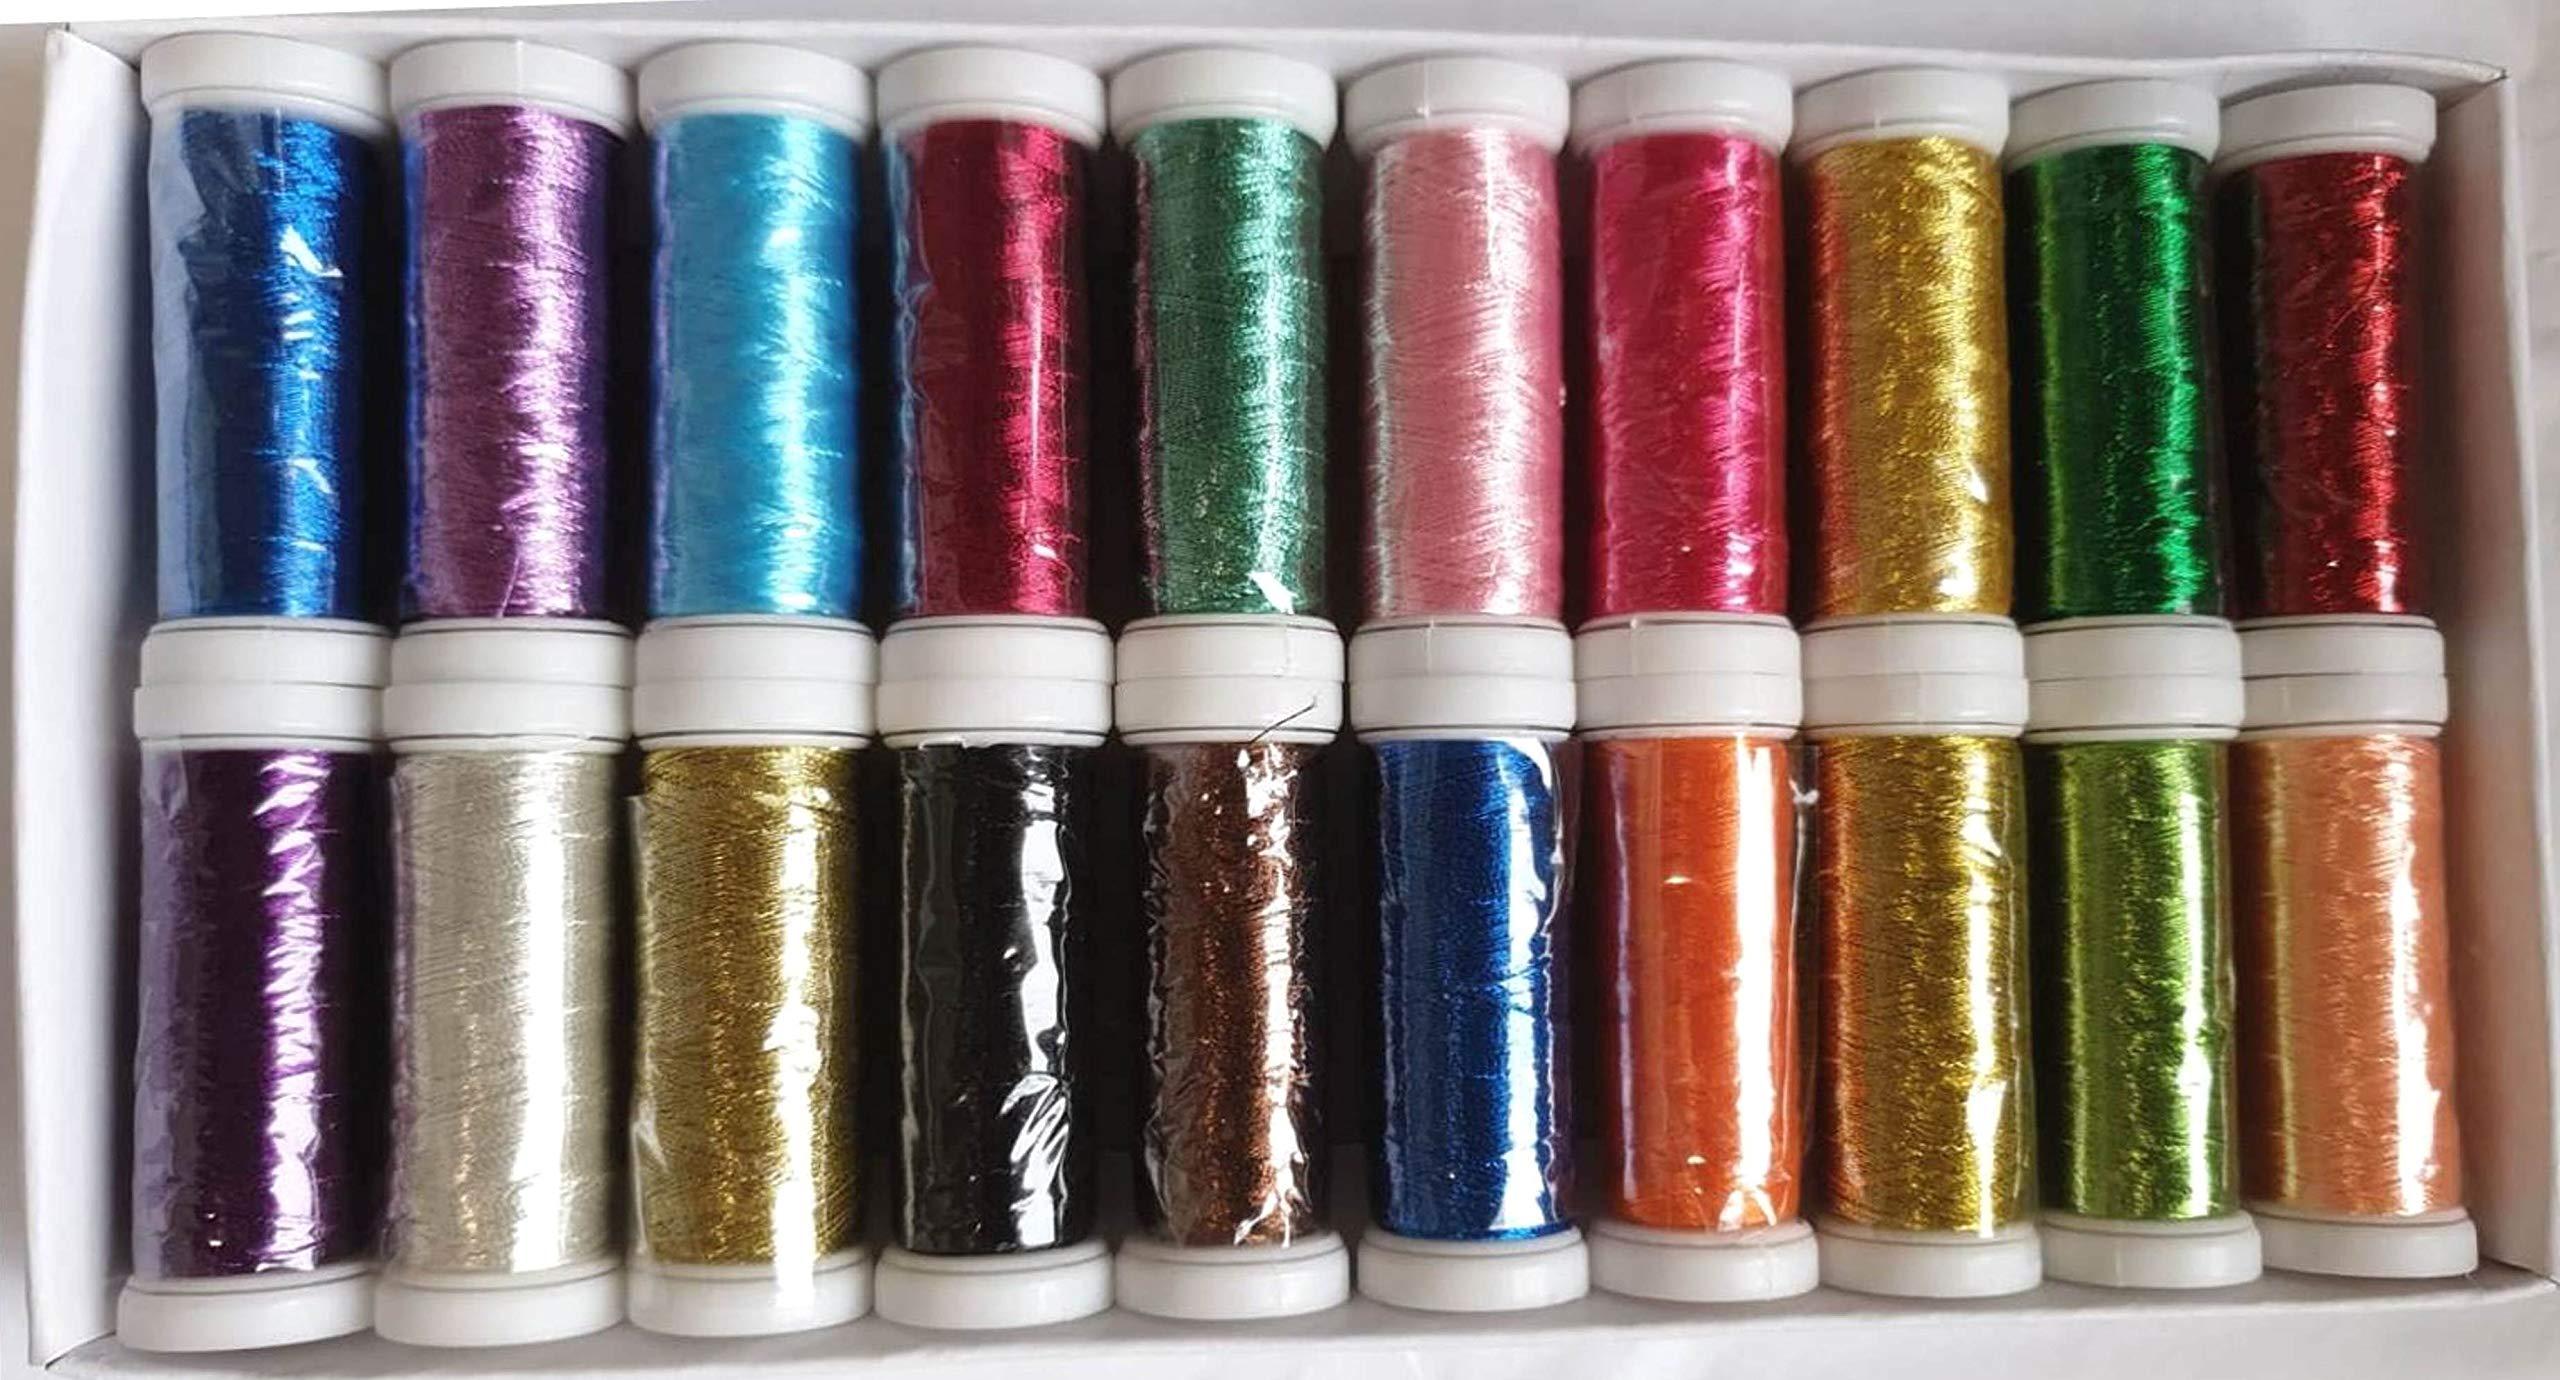 GCS 20 Metallic Embroidery Machine Thread Spools; 20 200 METERS EACH